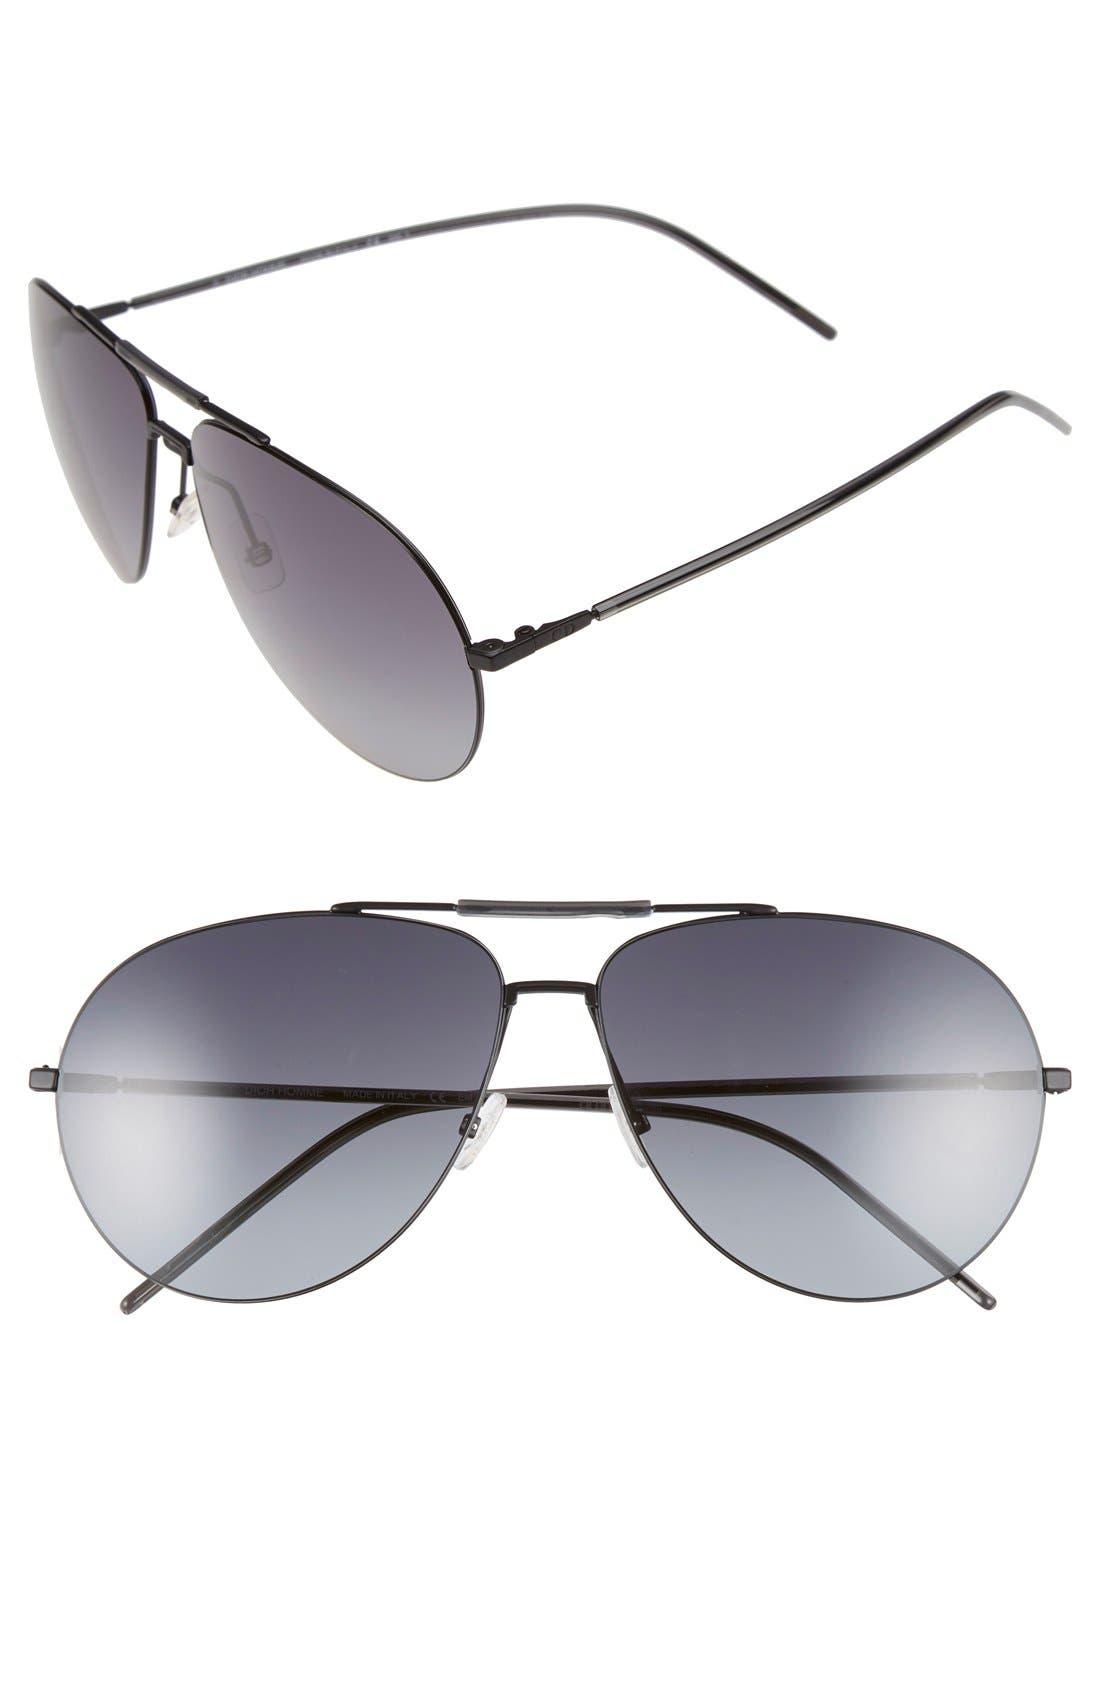 62mm Aviator Sunglasses,                             Main thumbnail 1, color,                             020